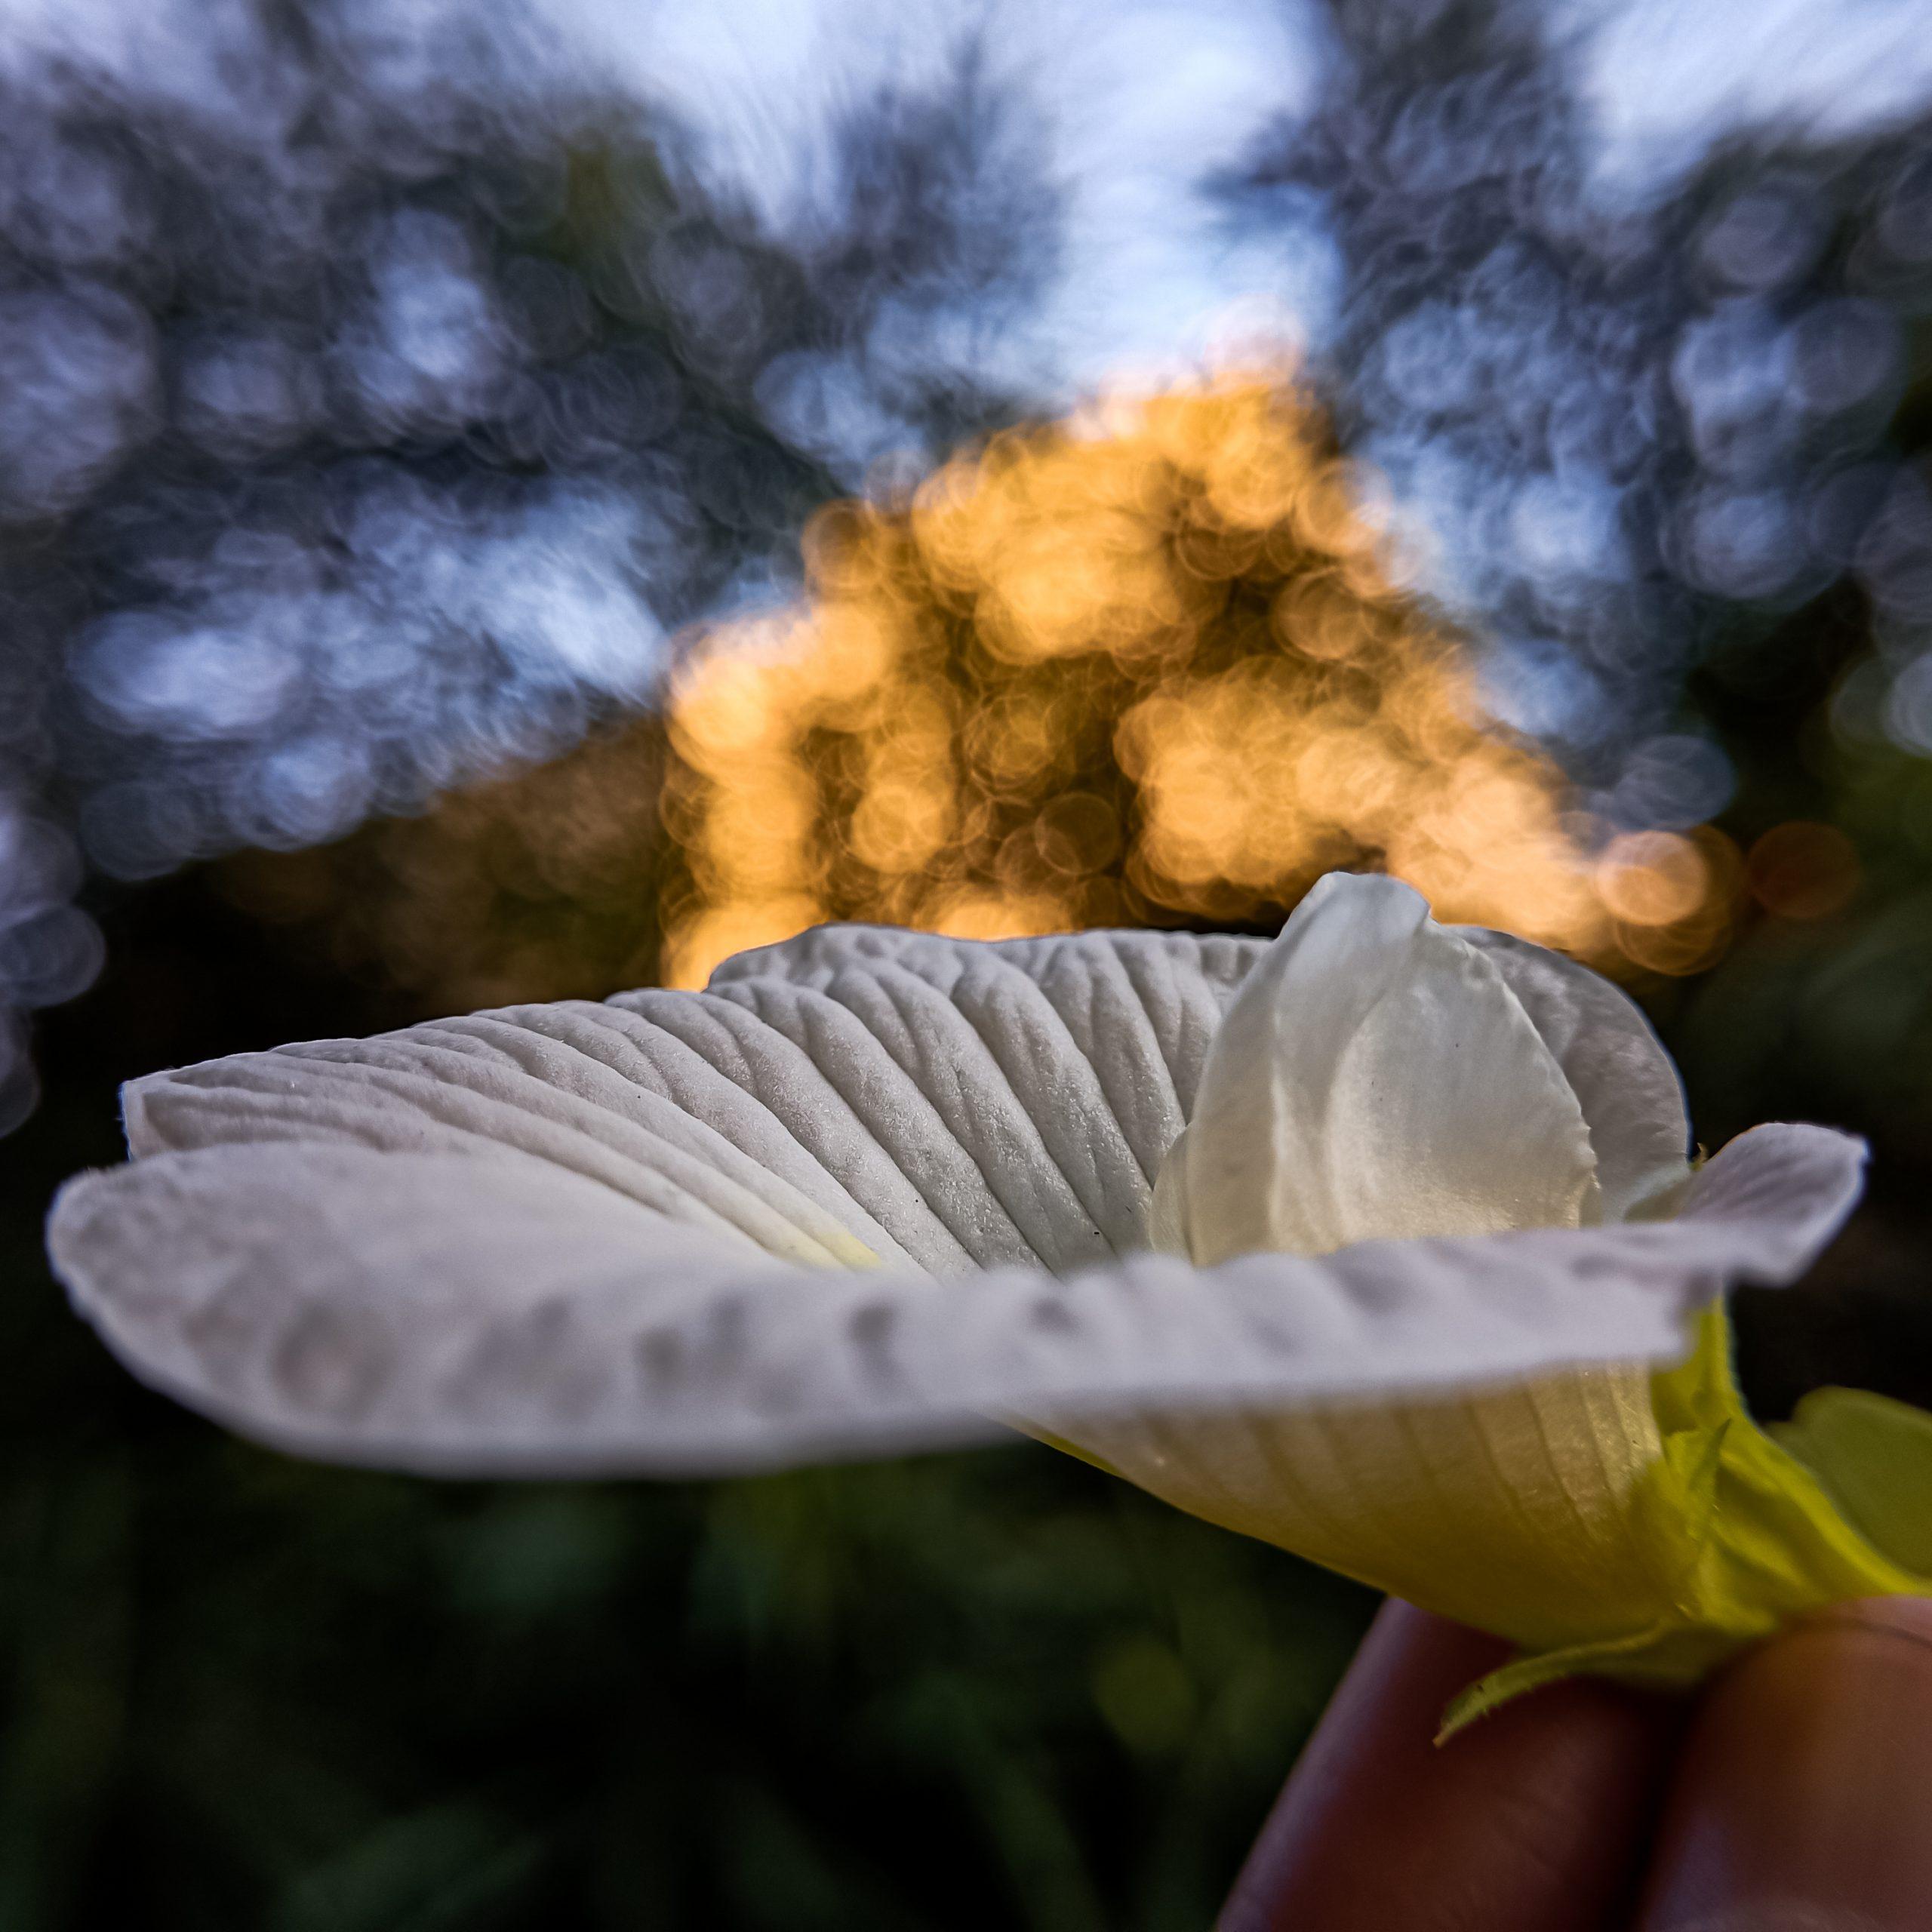 A white flower